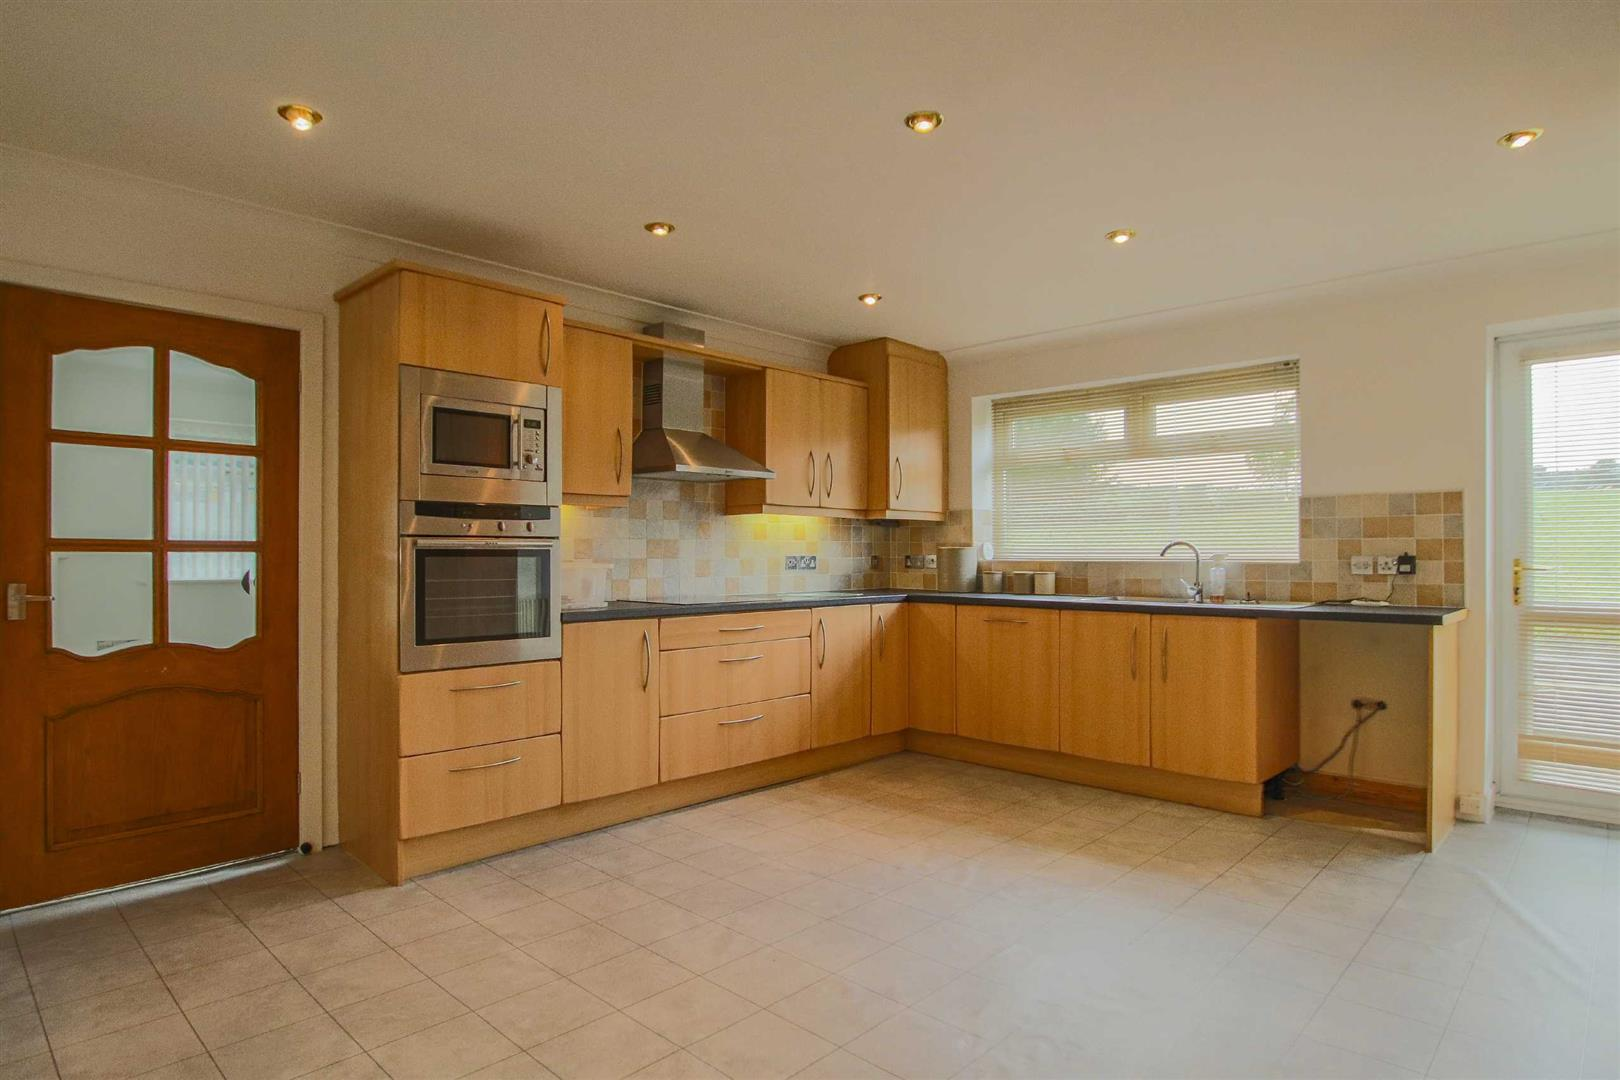 5 Bedroom Detached Bungalow For Sale - Image 7